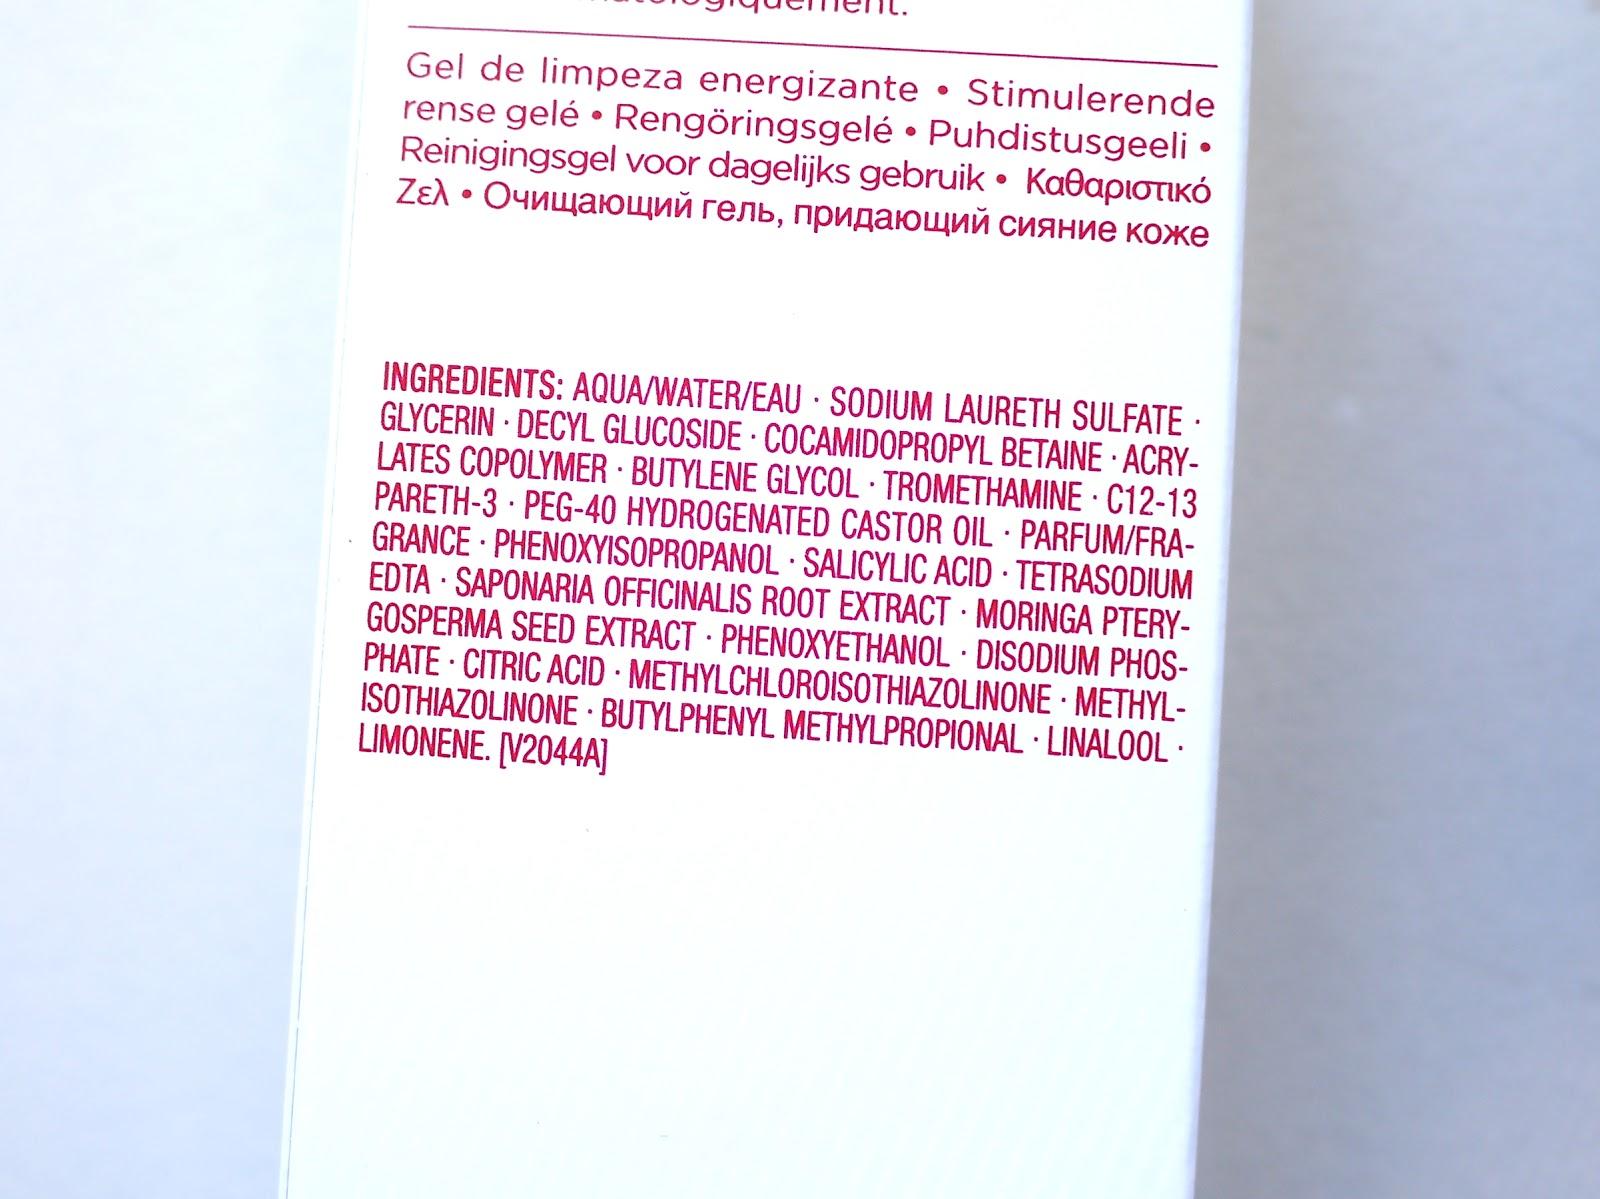 Clarins Daily Energizer Cleansing Gel ingredients